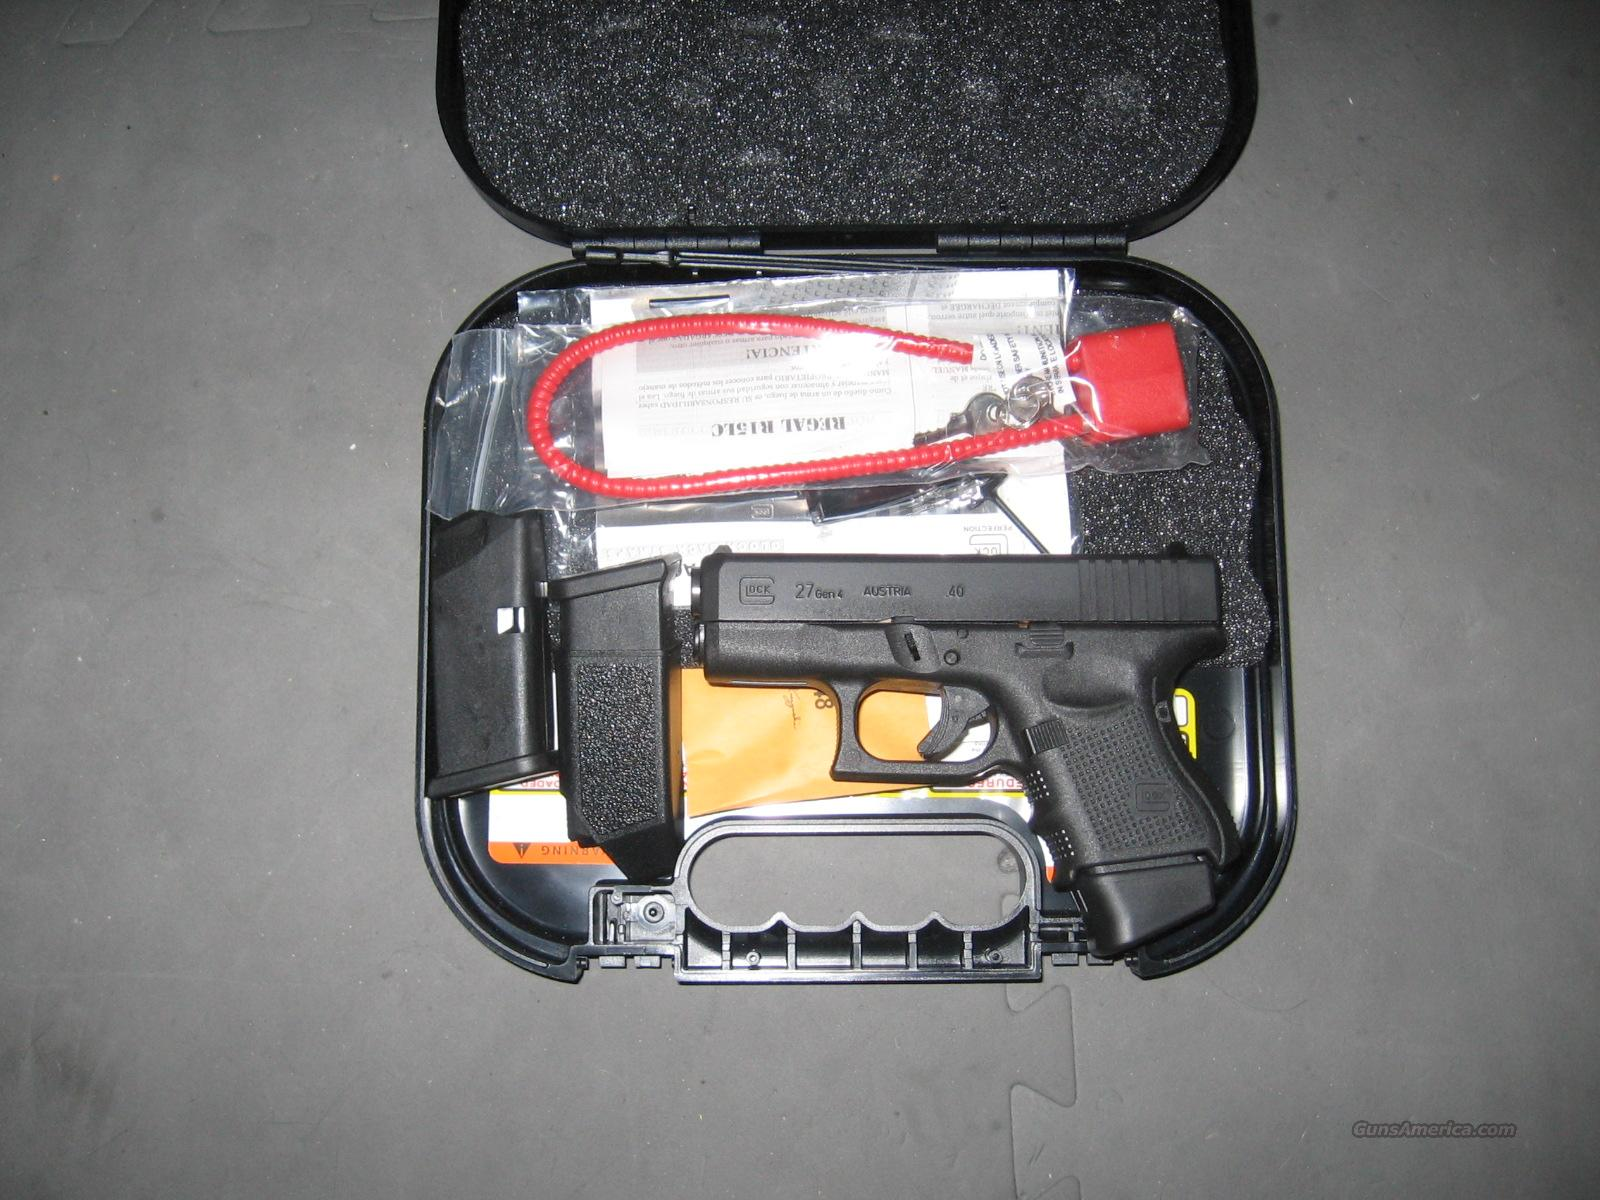 Glock 27 gen 4  Guns > Pistols > Glock Pistols > 26/27